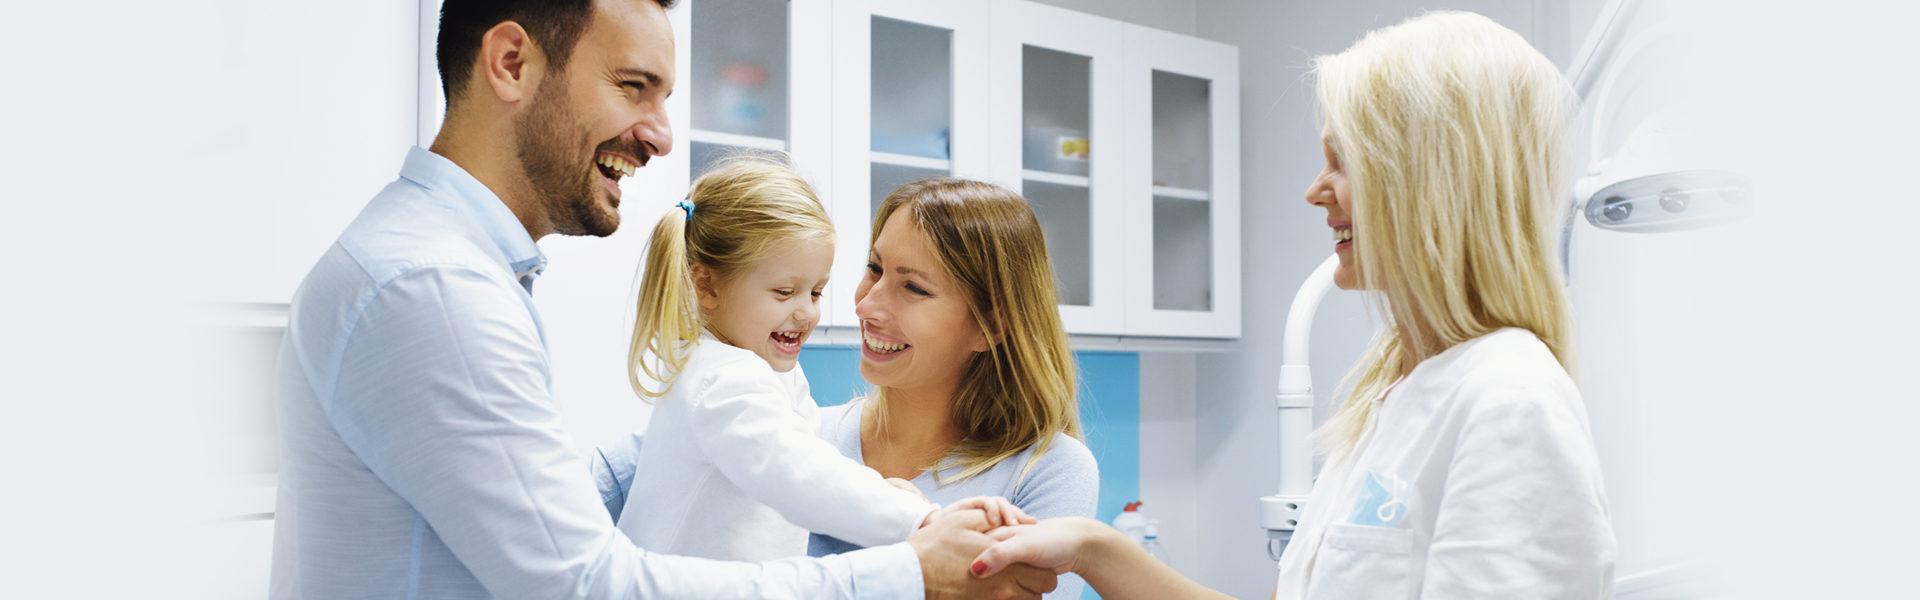 Children's Dentistry in Cupertino, CA